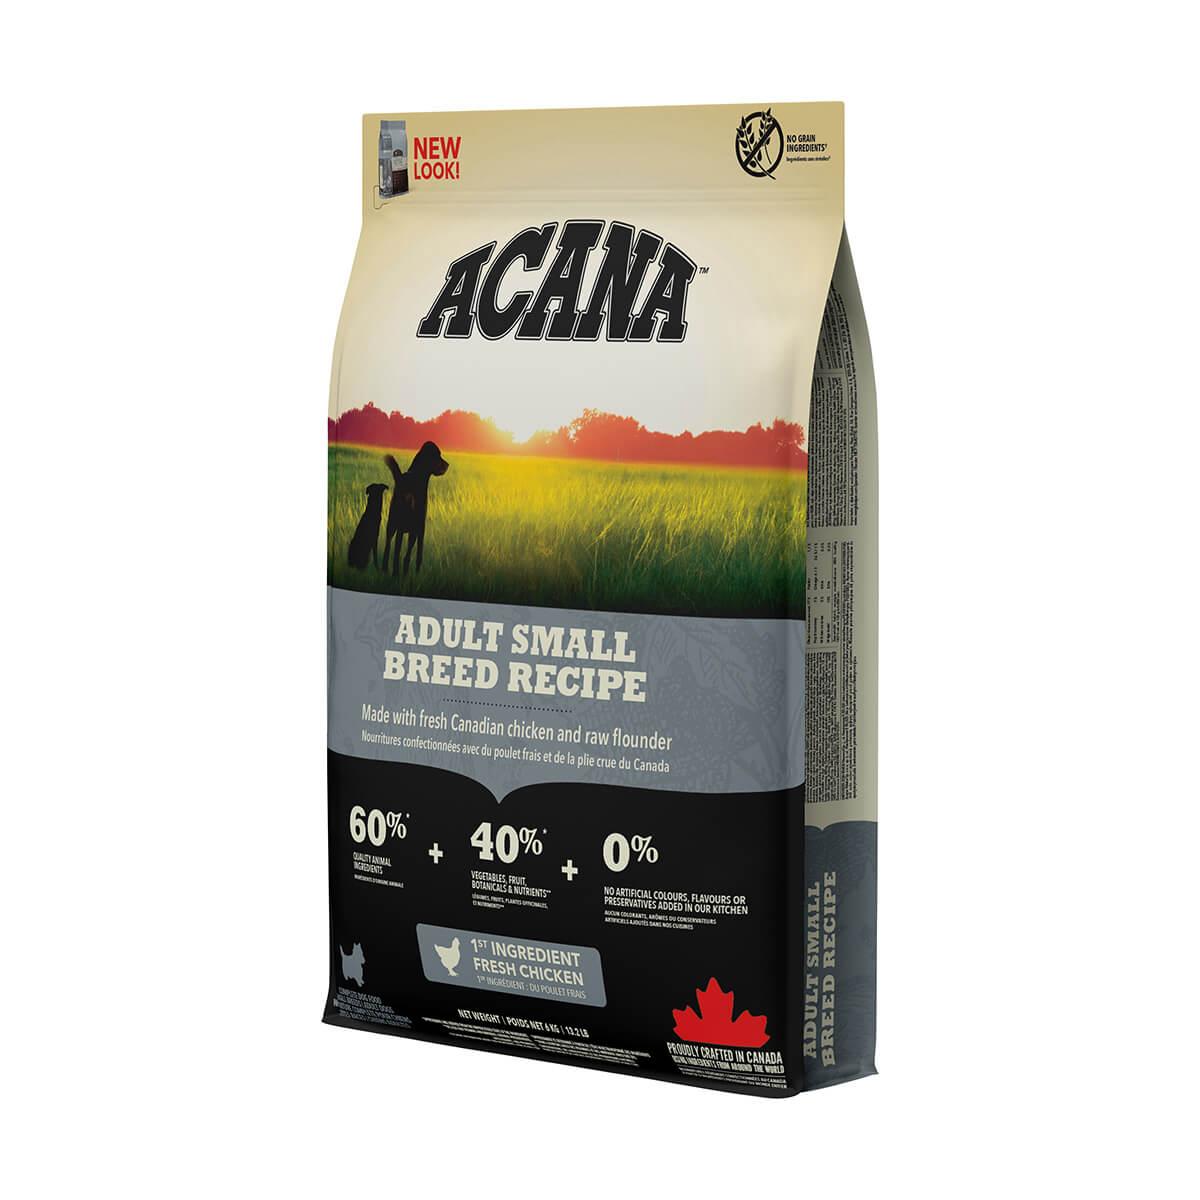 Acana Adult Small Breed - Dog Food - 6 kg